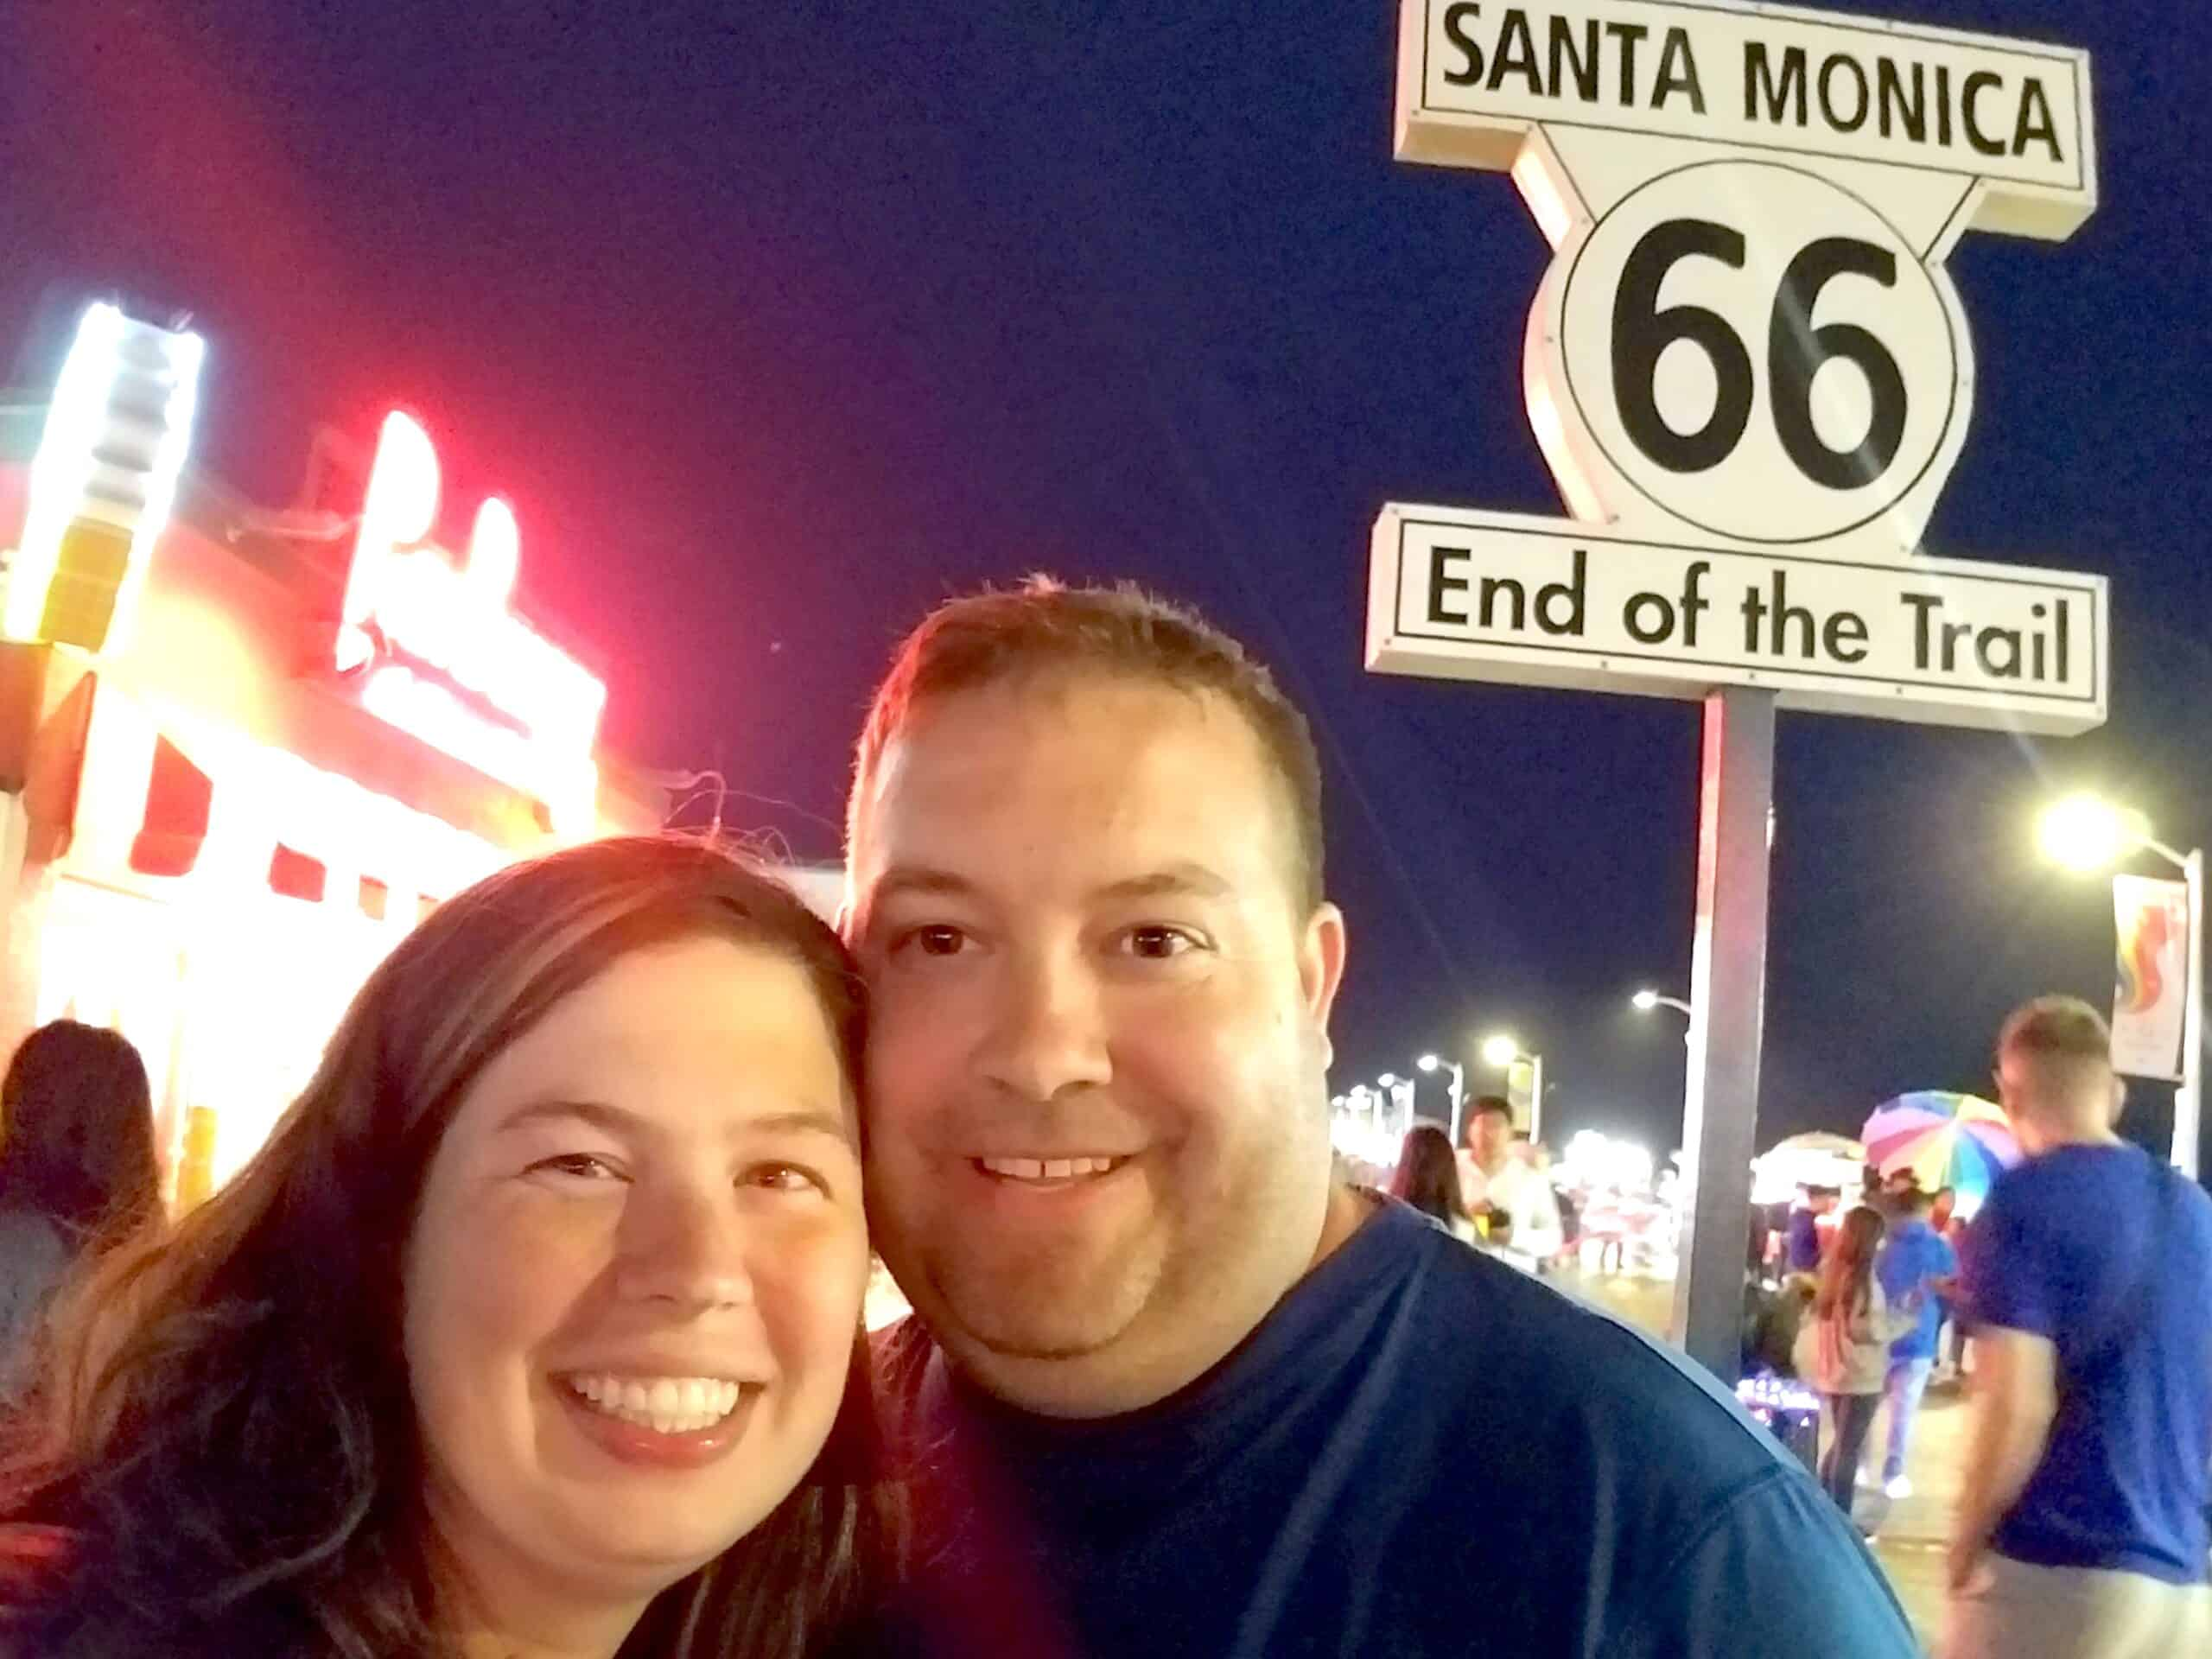 couple at Santa Monica Route 66